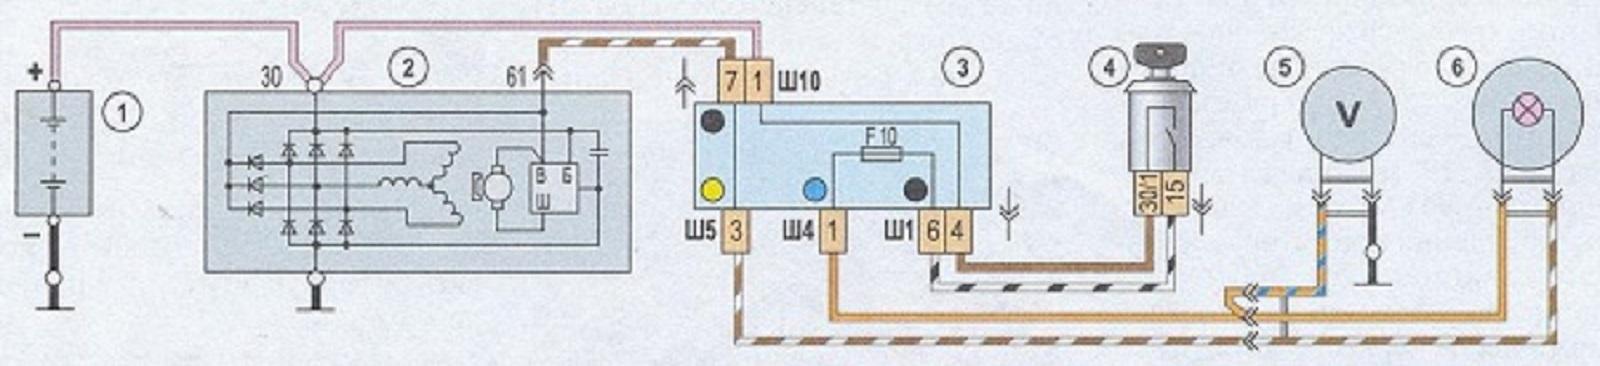 Схема установки грм на киа 773